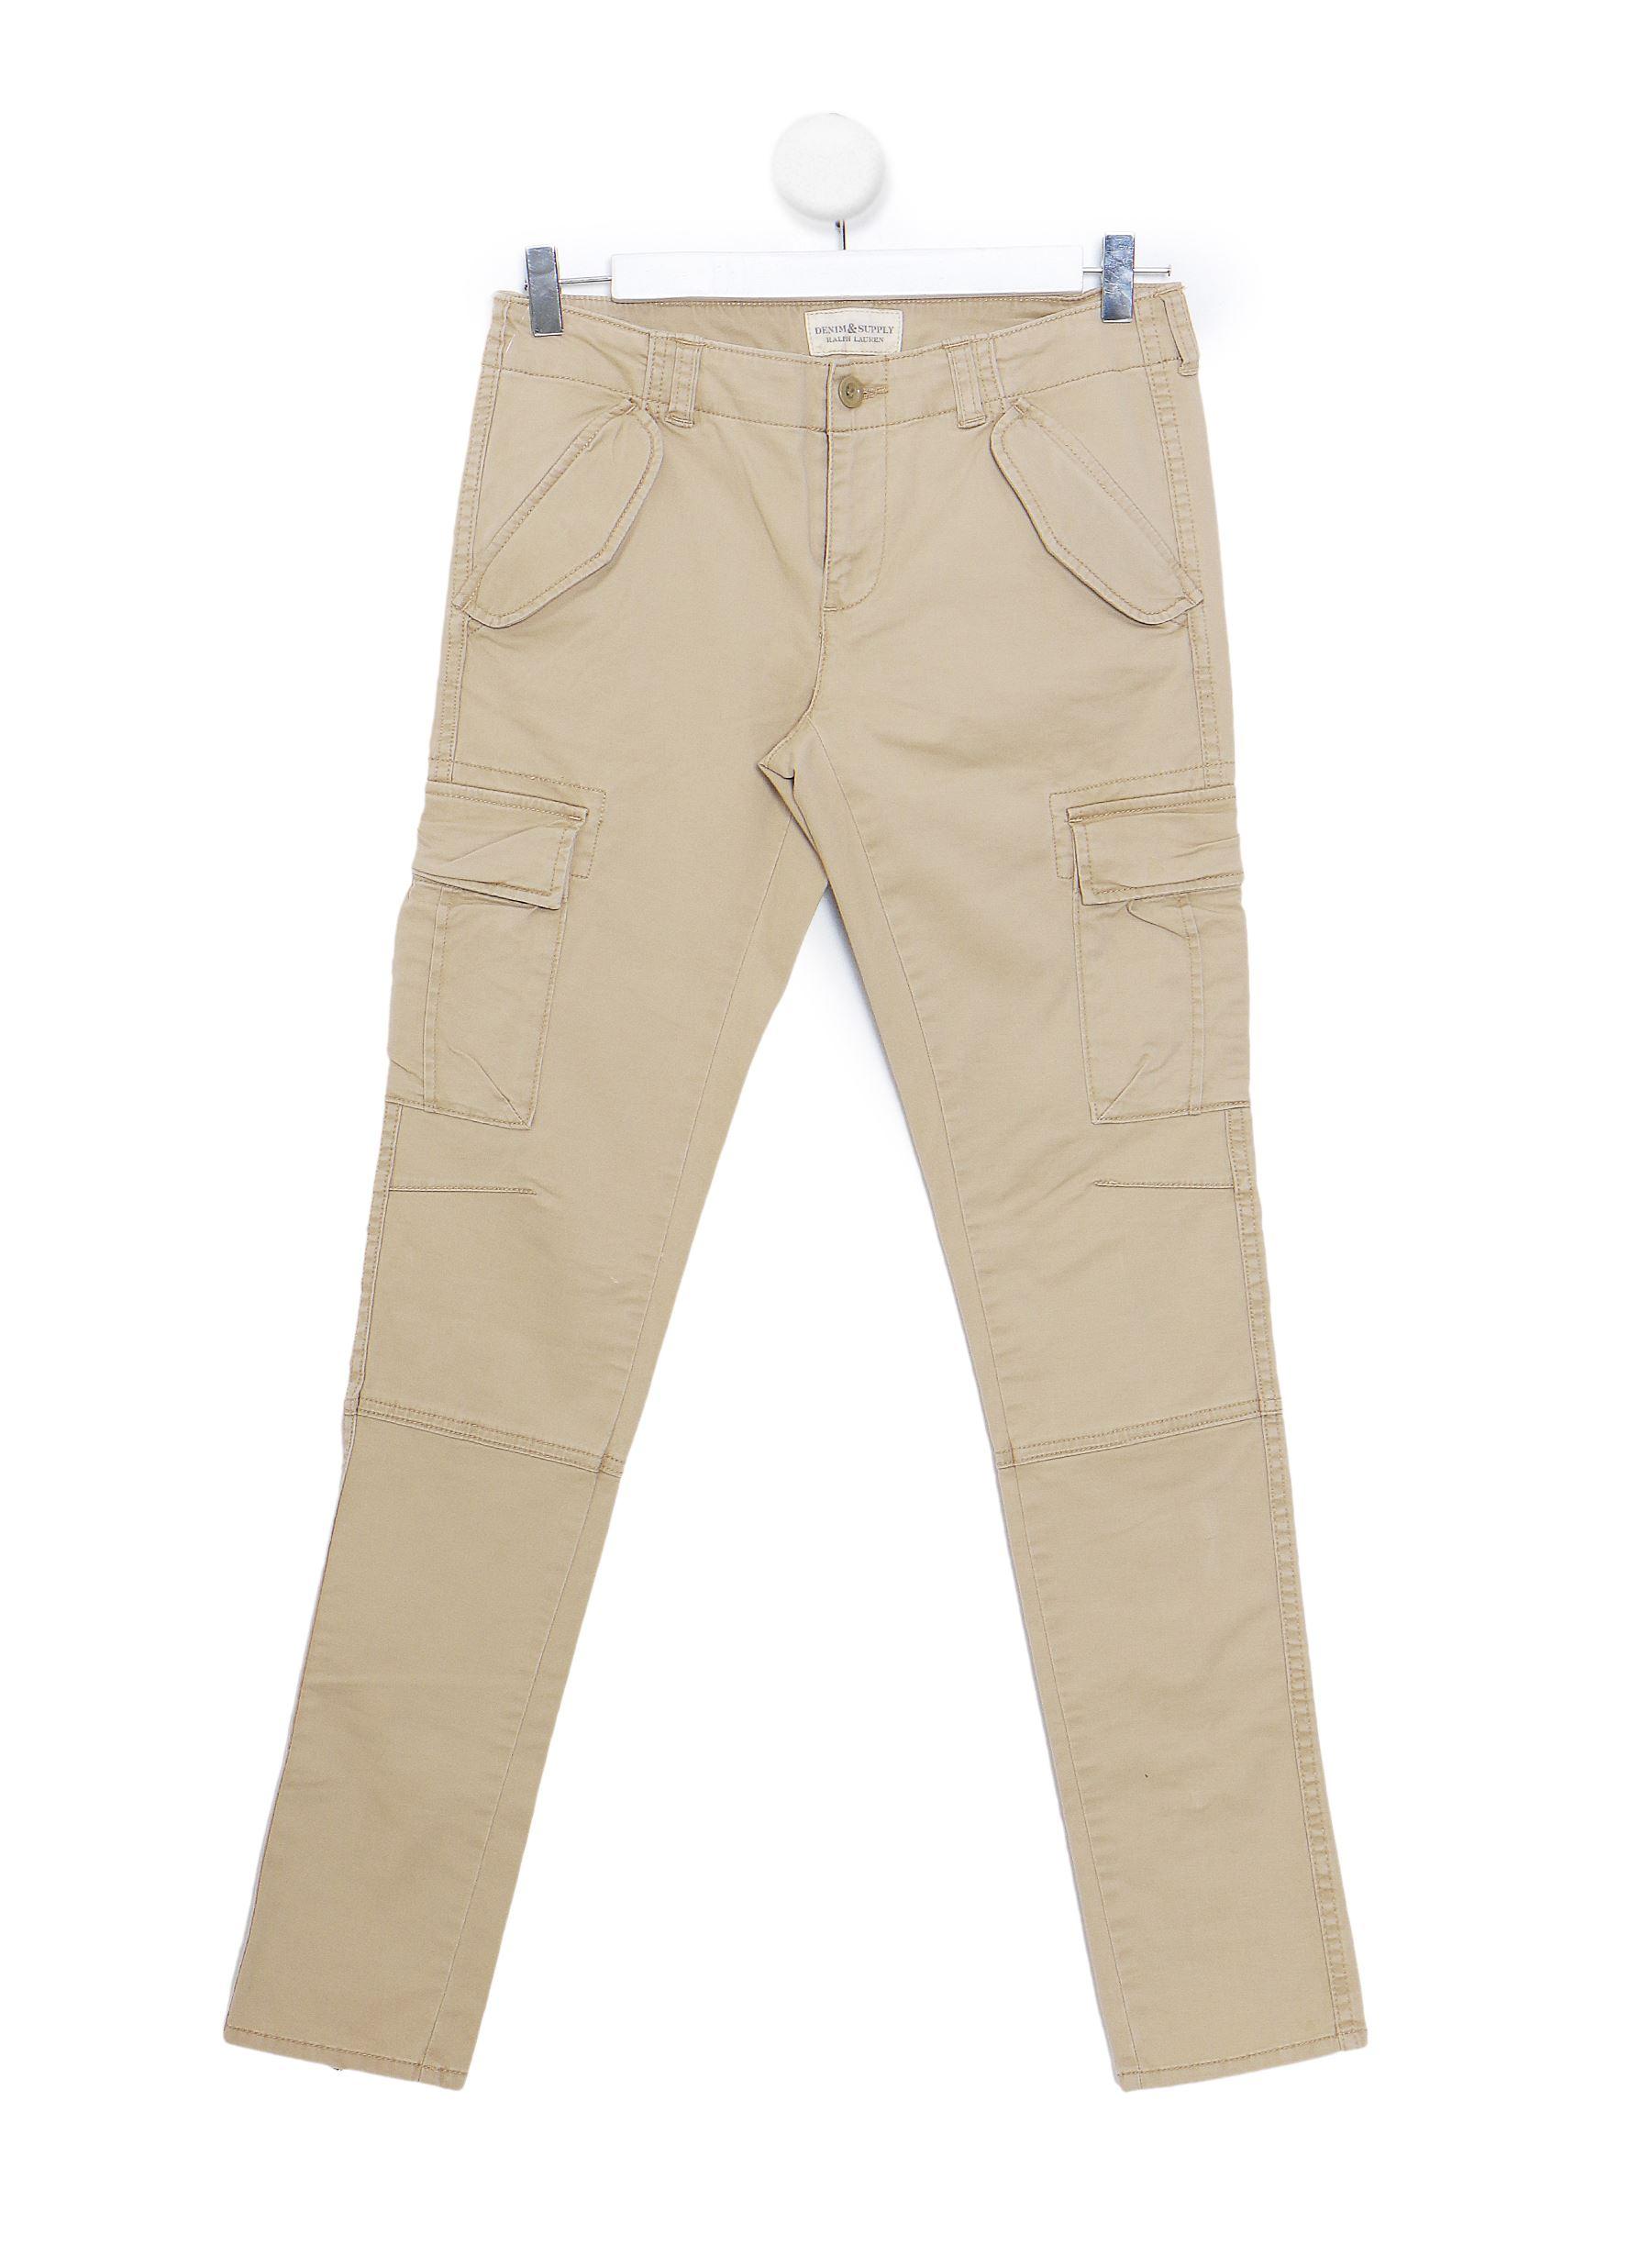 Polo Ralph Lauren - Γυναικείο Παντελόνι DENIM & SUPPLY RL